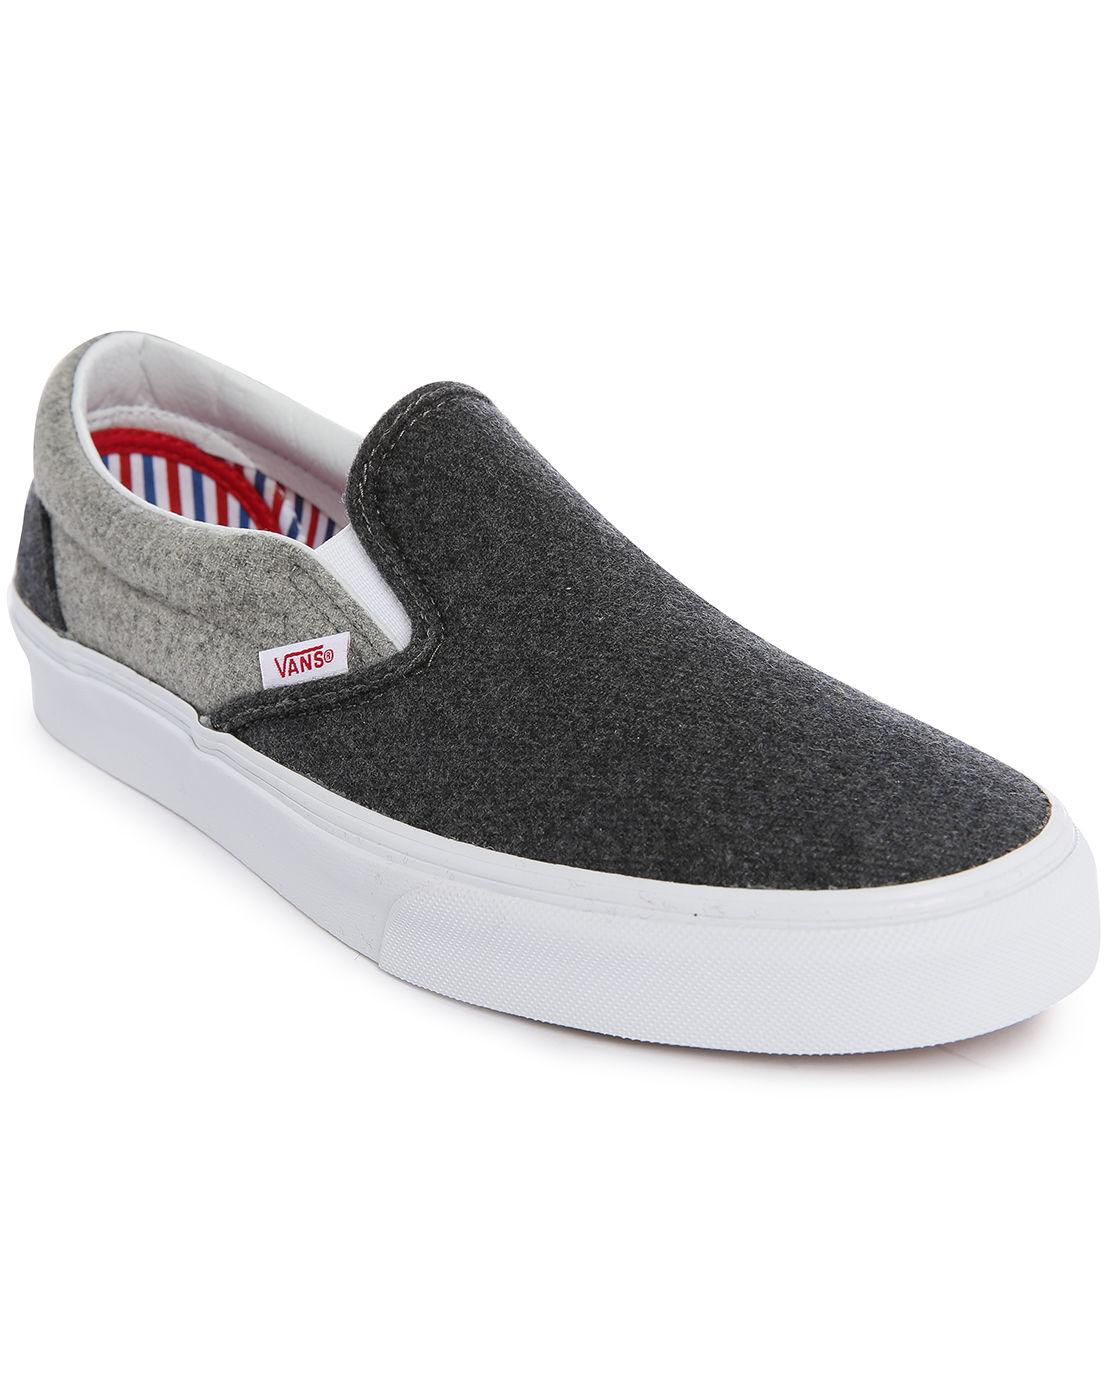 vans wool sport grey slip ons in gray for men grey lyst. Black Bedroom Furniture Sets. Home Design Ideas